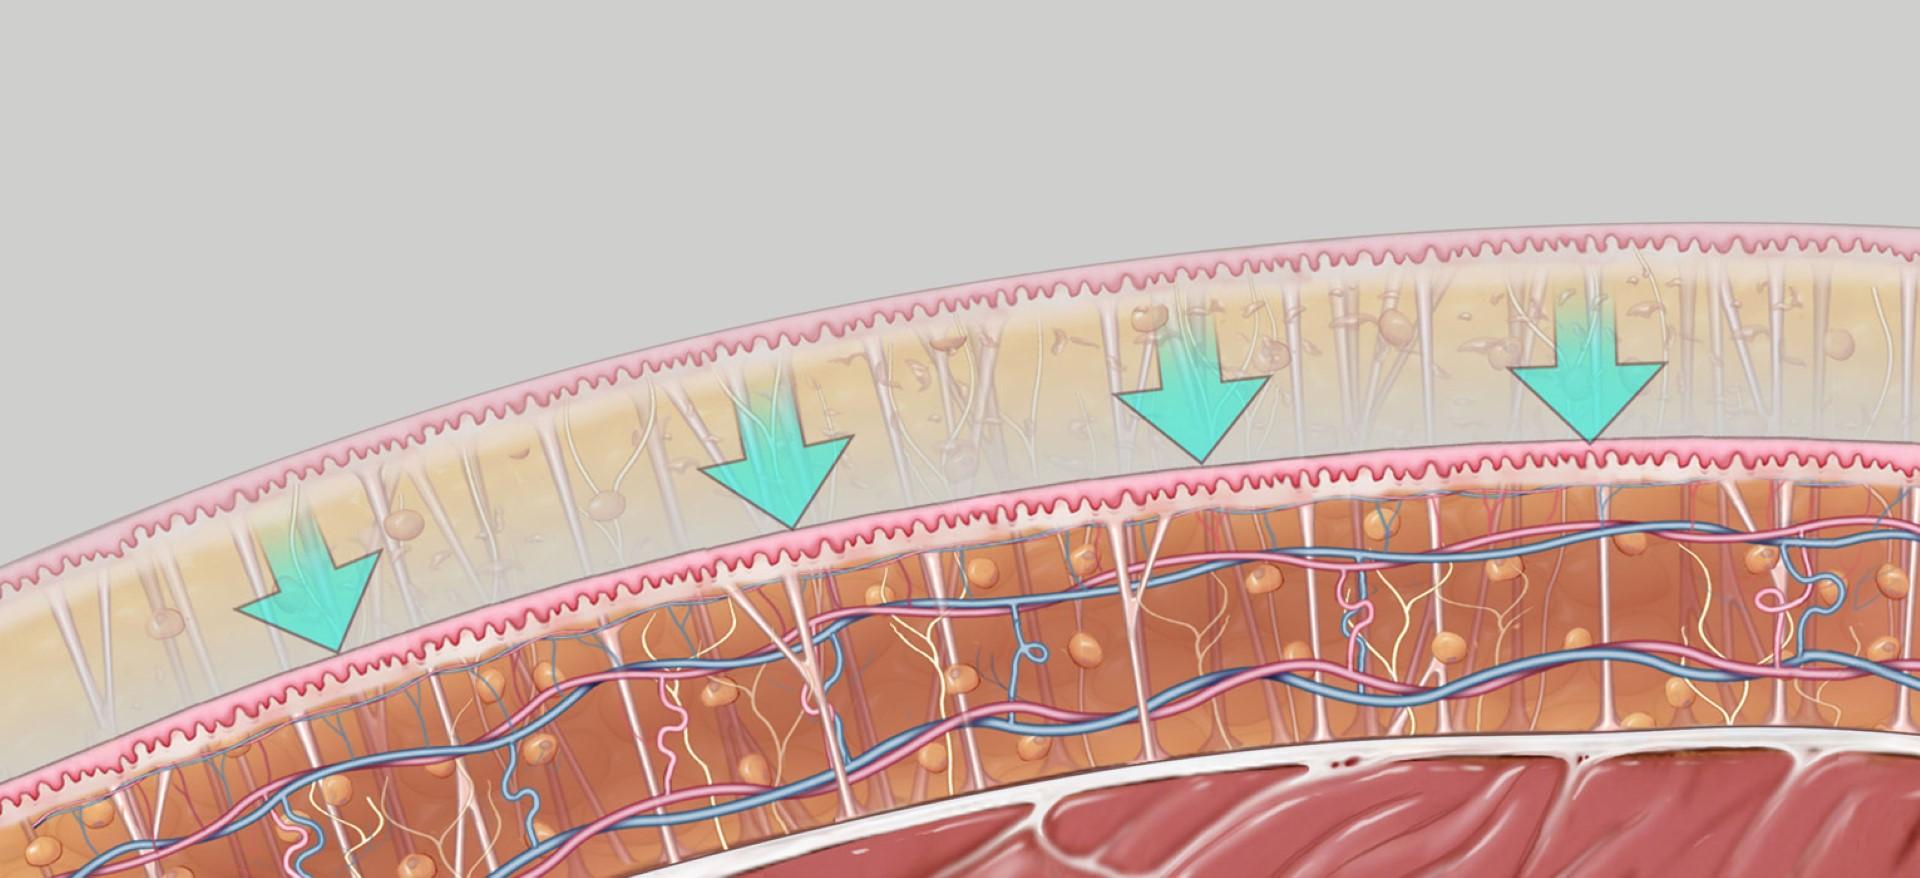 CI 5 - Skin Retraction (Large)